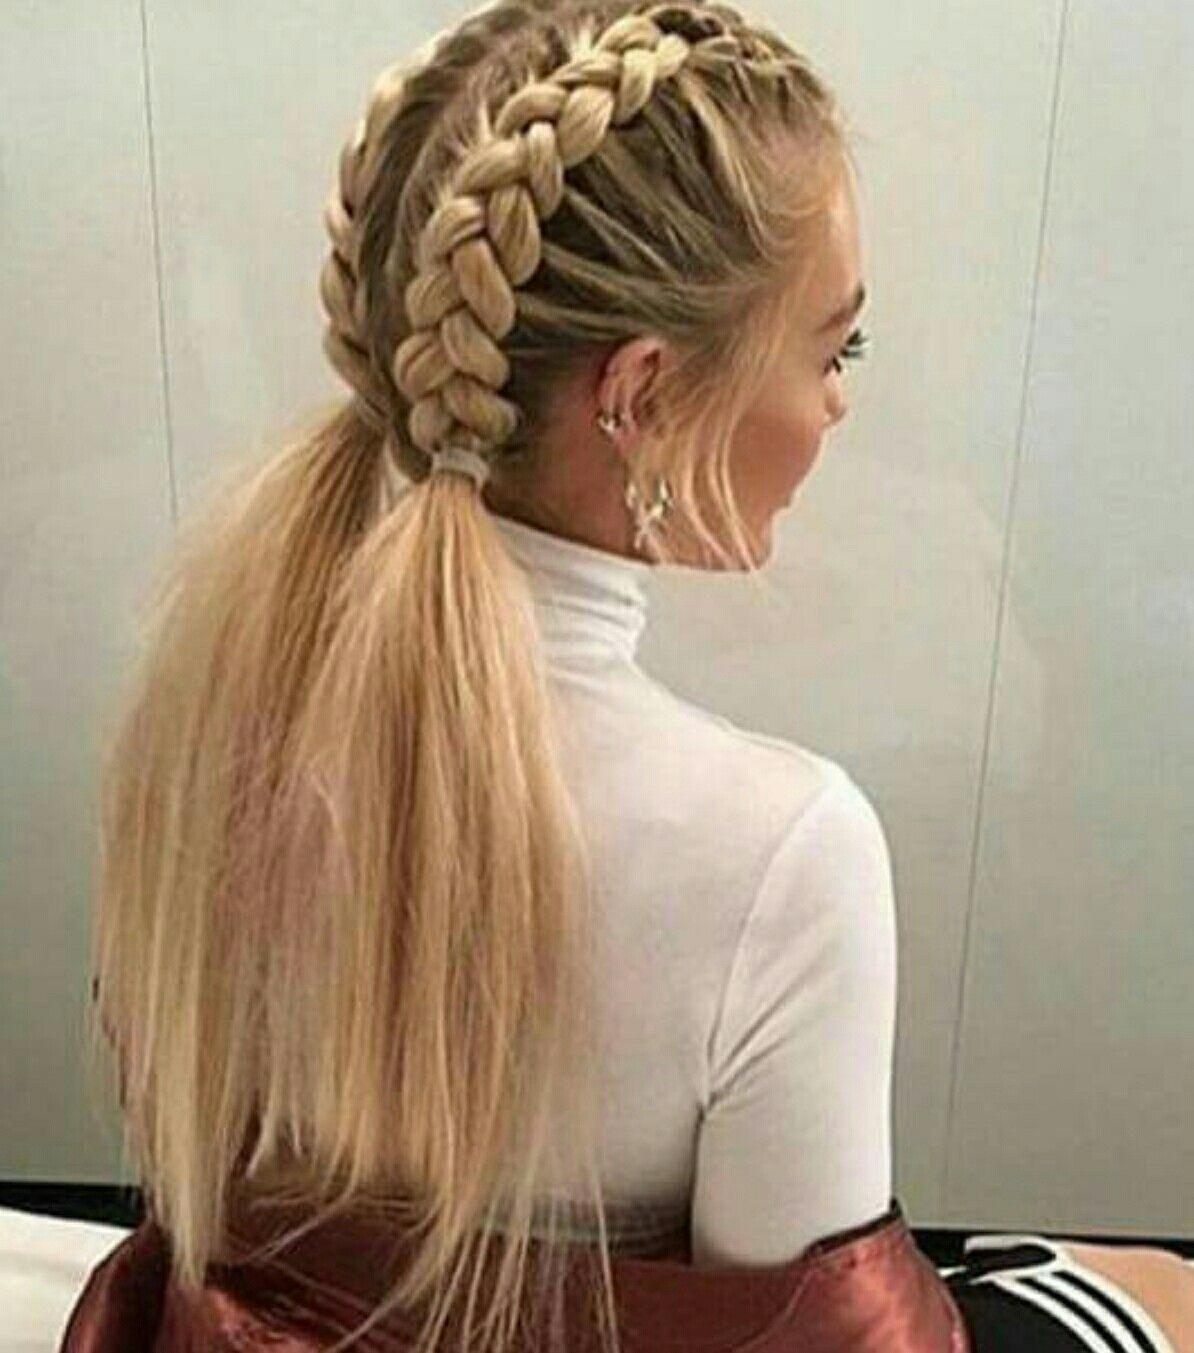 pin by stephanie hurzeler on hair extravagance | hair, long